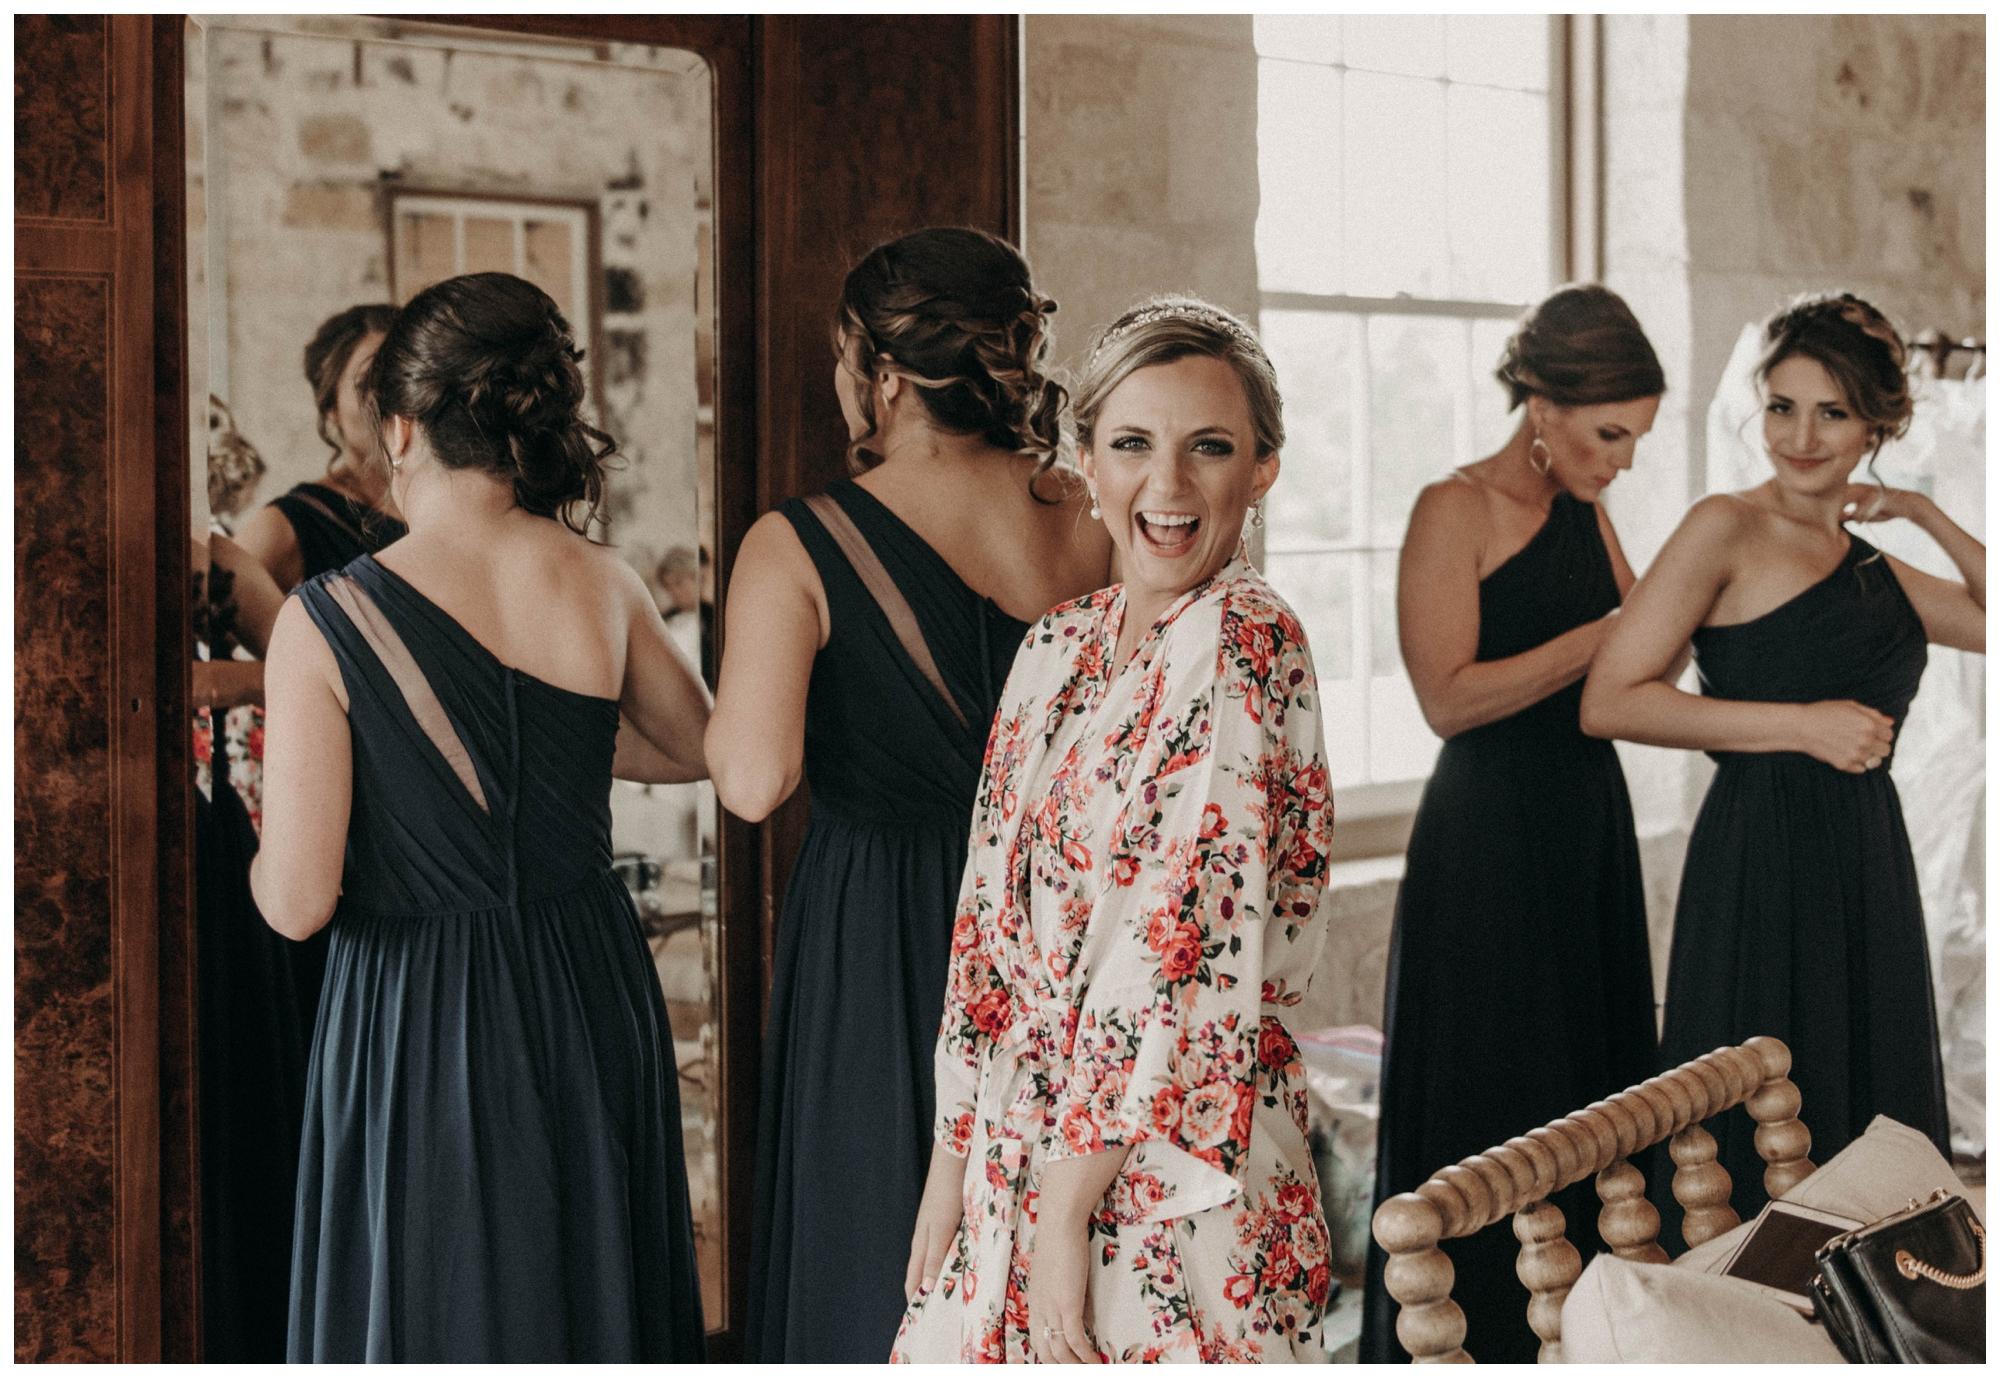 austin-texas-wedding-photography-1778-photographie_0014.jpg